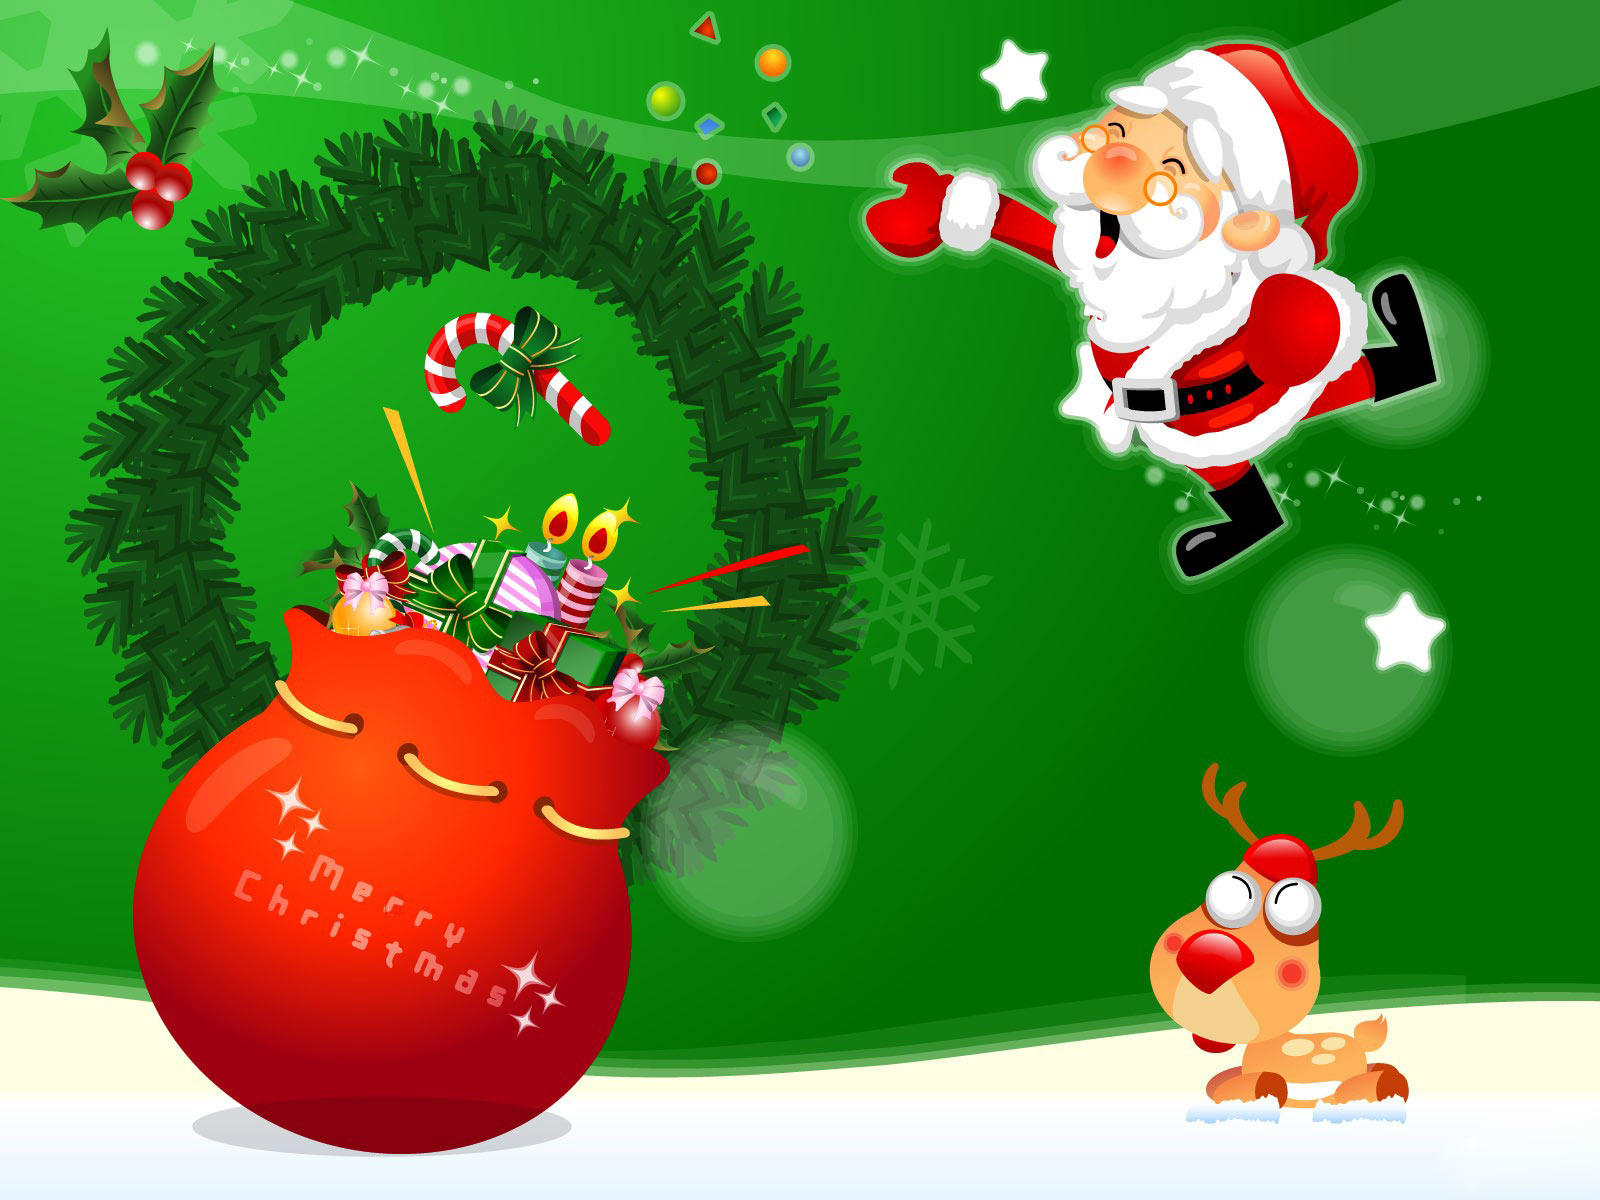 iPad Christmas Wallpapers iPad Retina HD Wallpapers 1600x1200